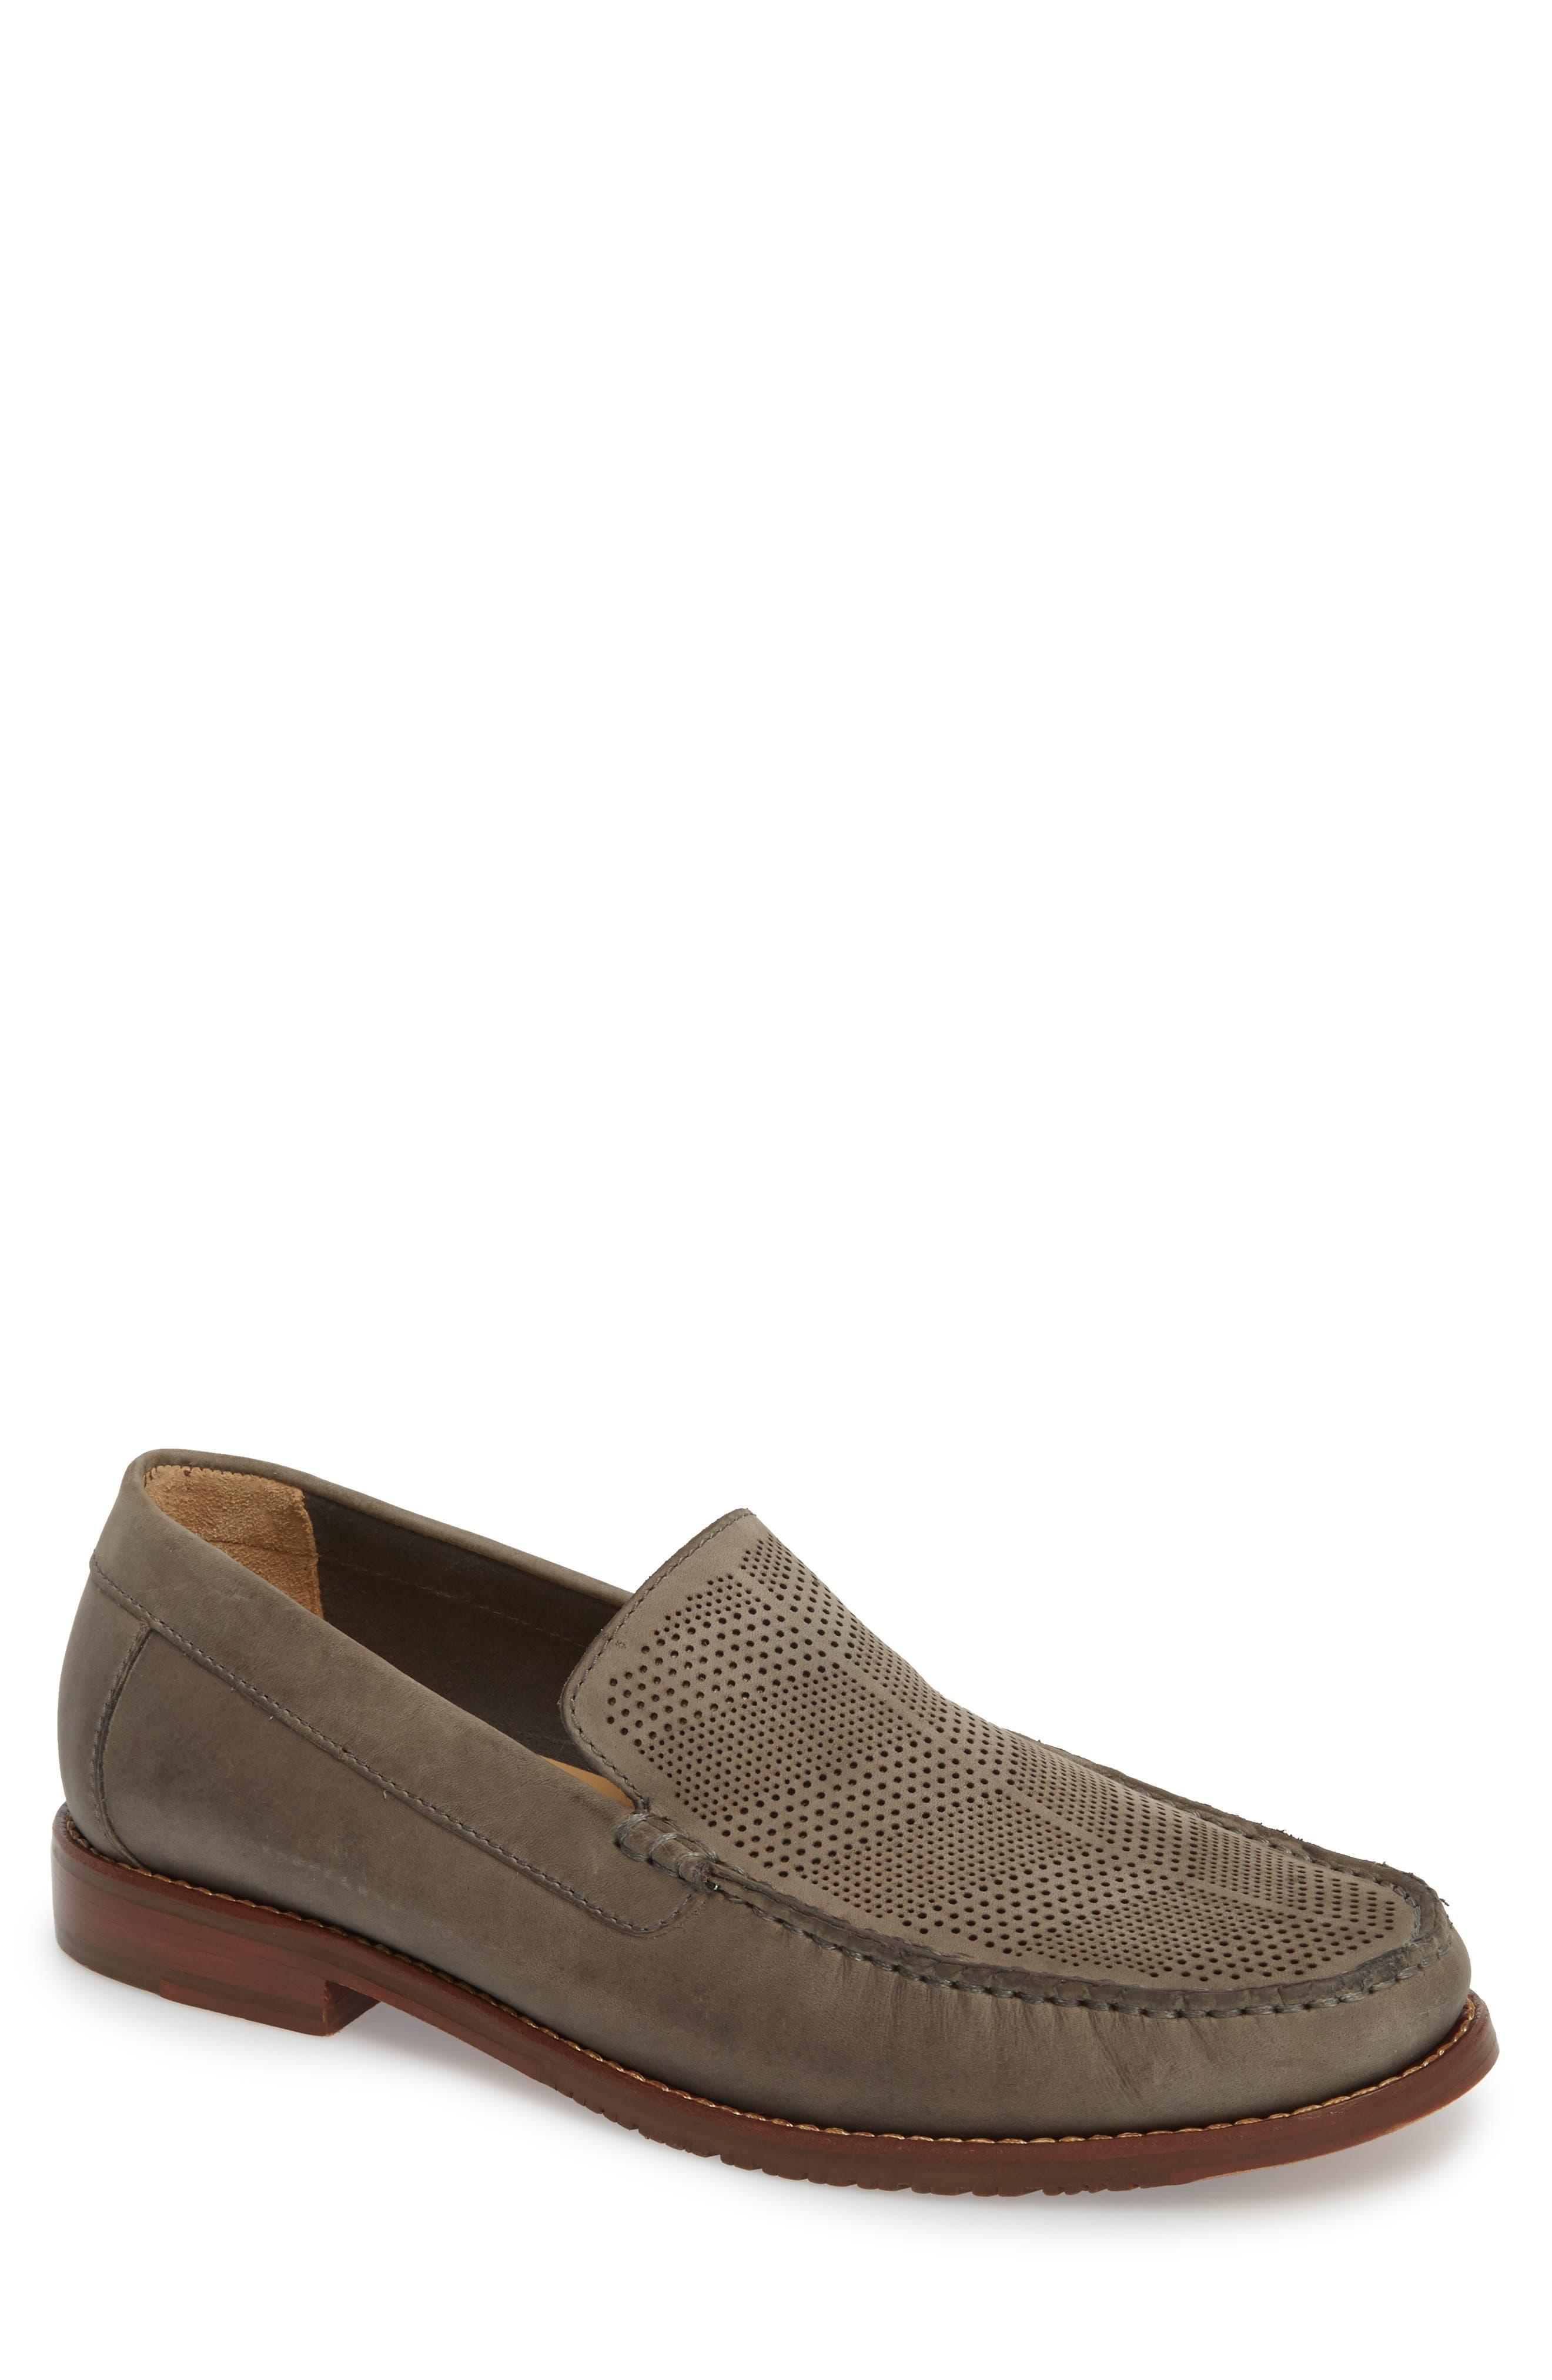 Felton II Venetian Loafer,                         Main,                         color, Grey Nubuck